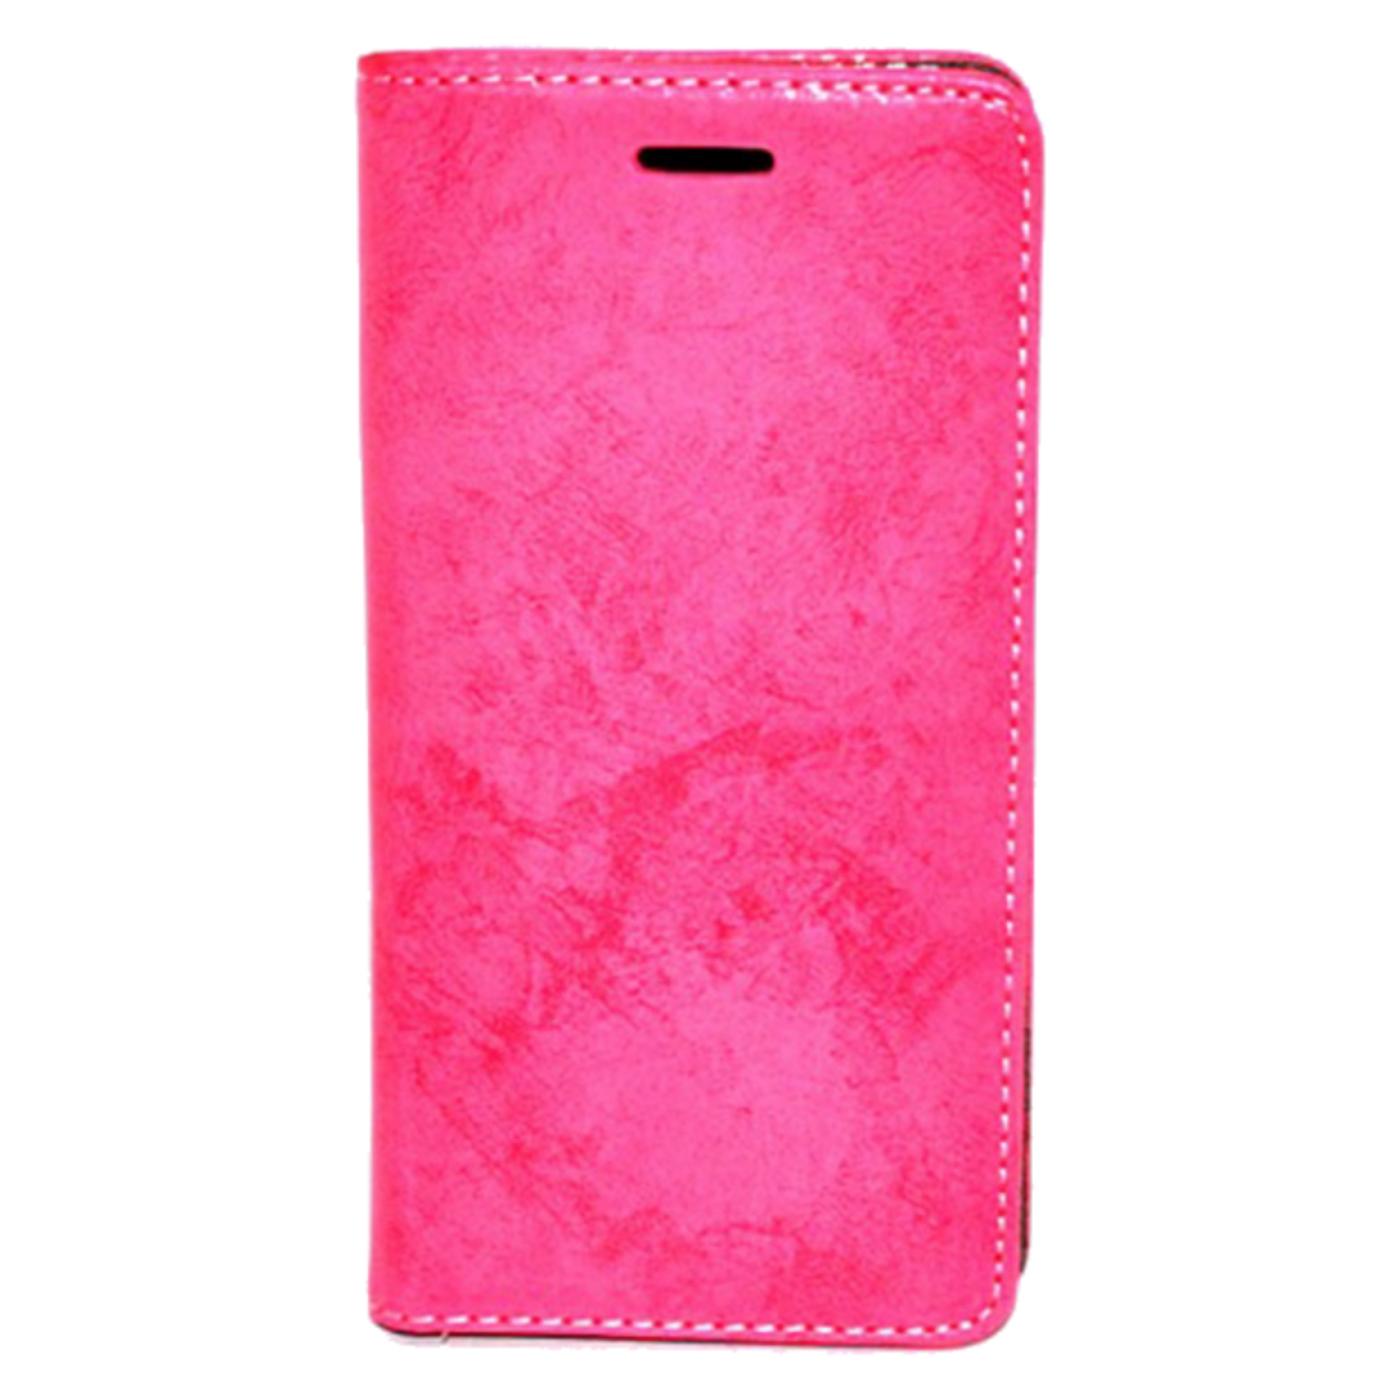 Futrola za mobitel Samsung A5, FLIP, pink